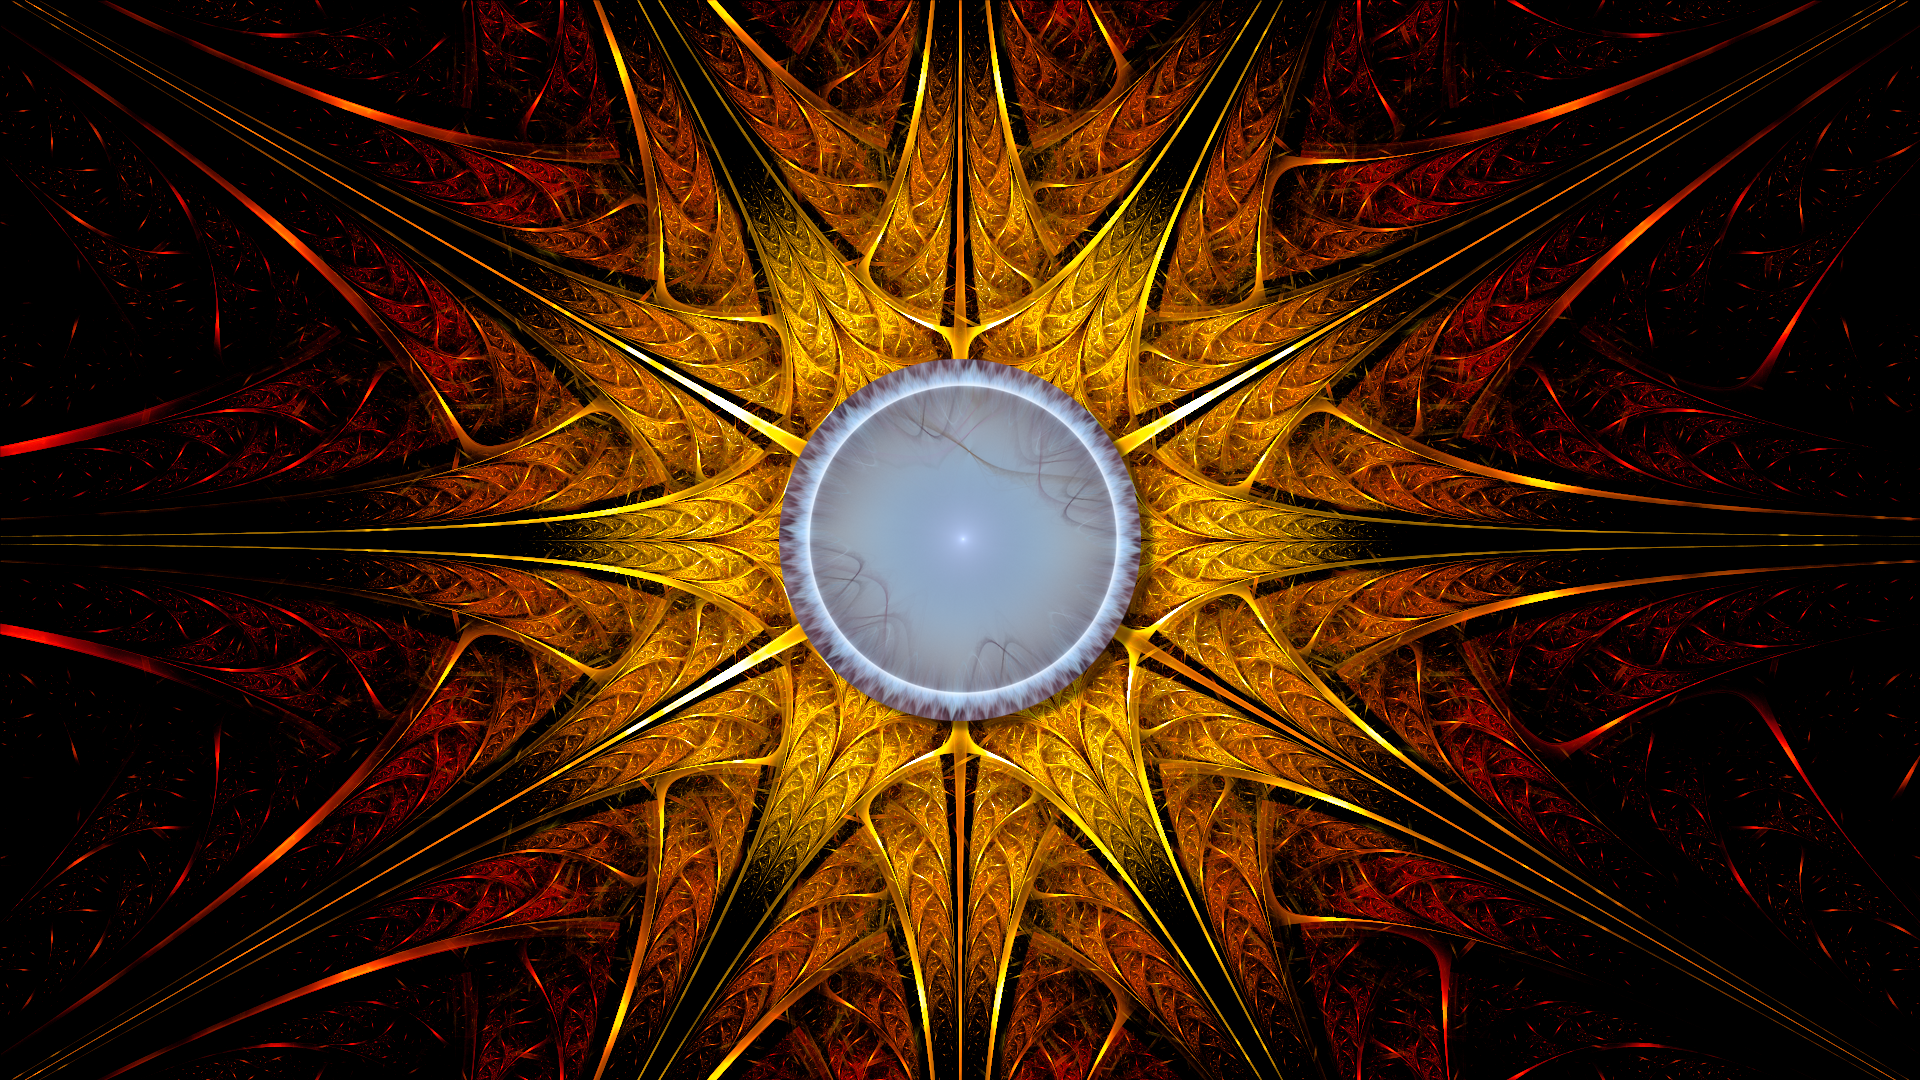 Parvan's Amulet by Fractamonium